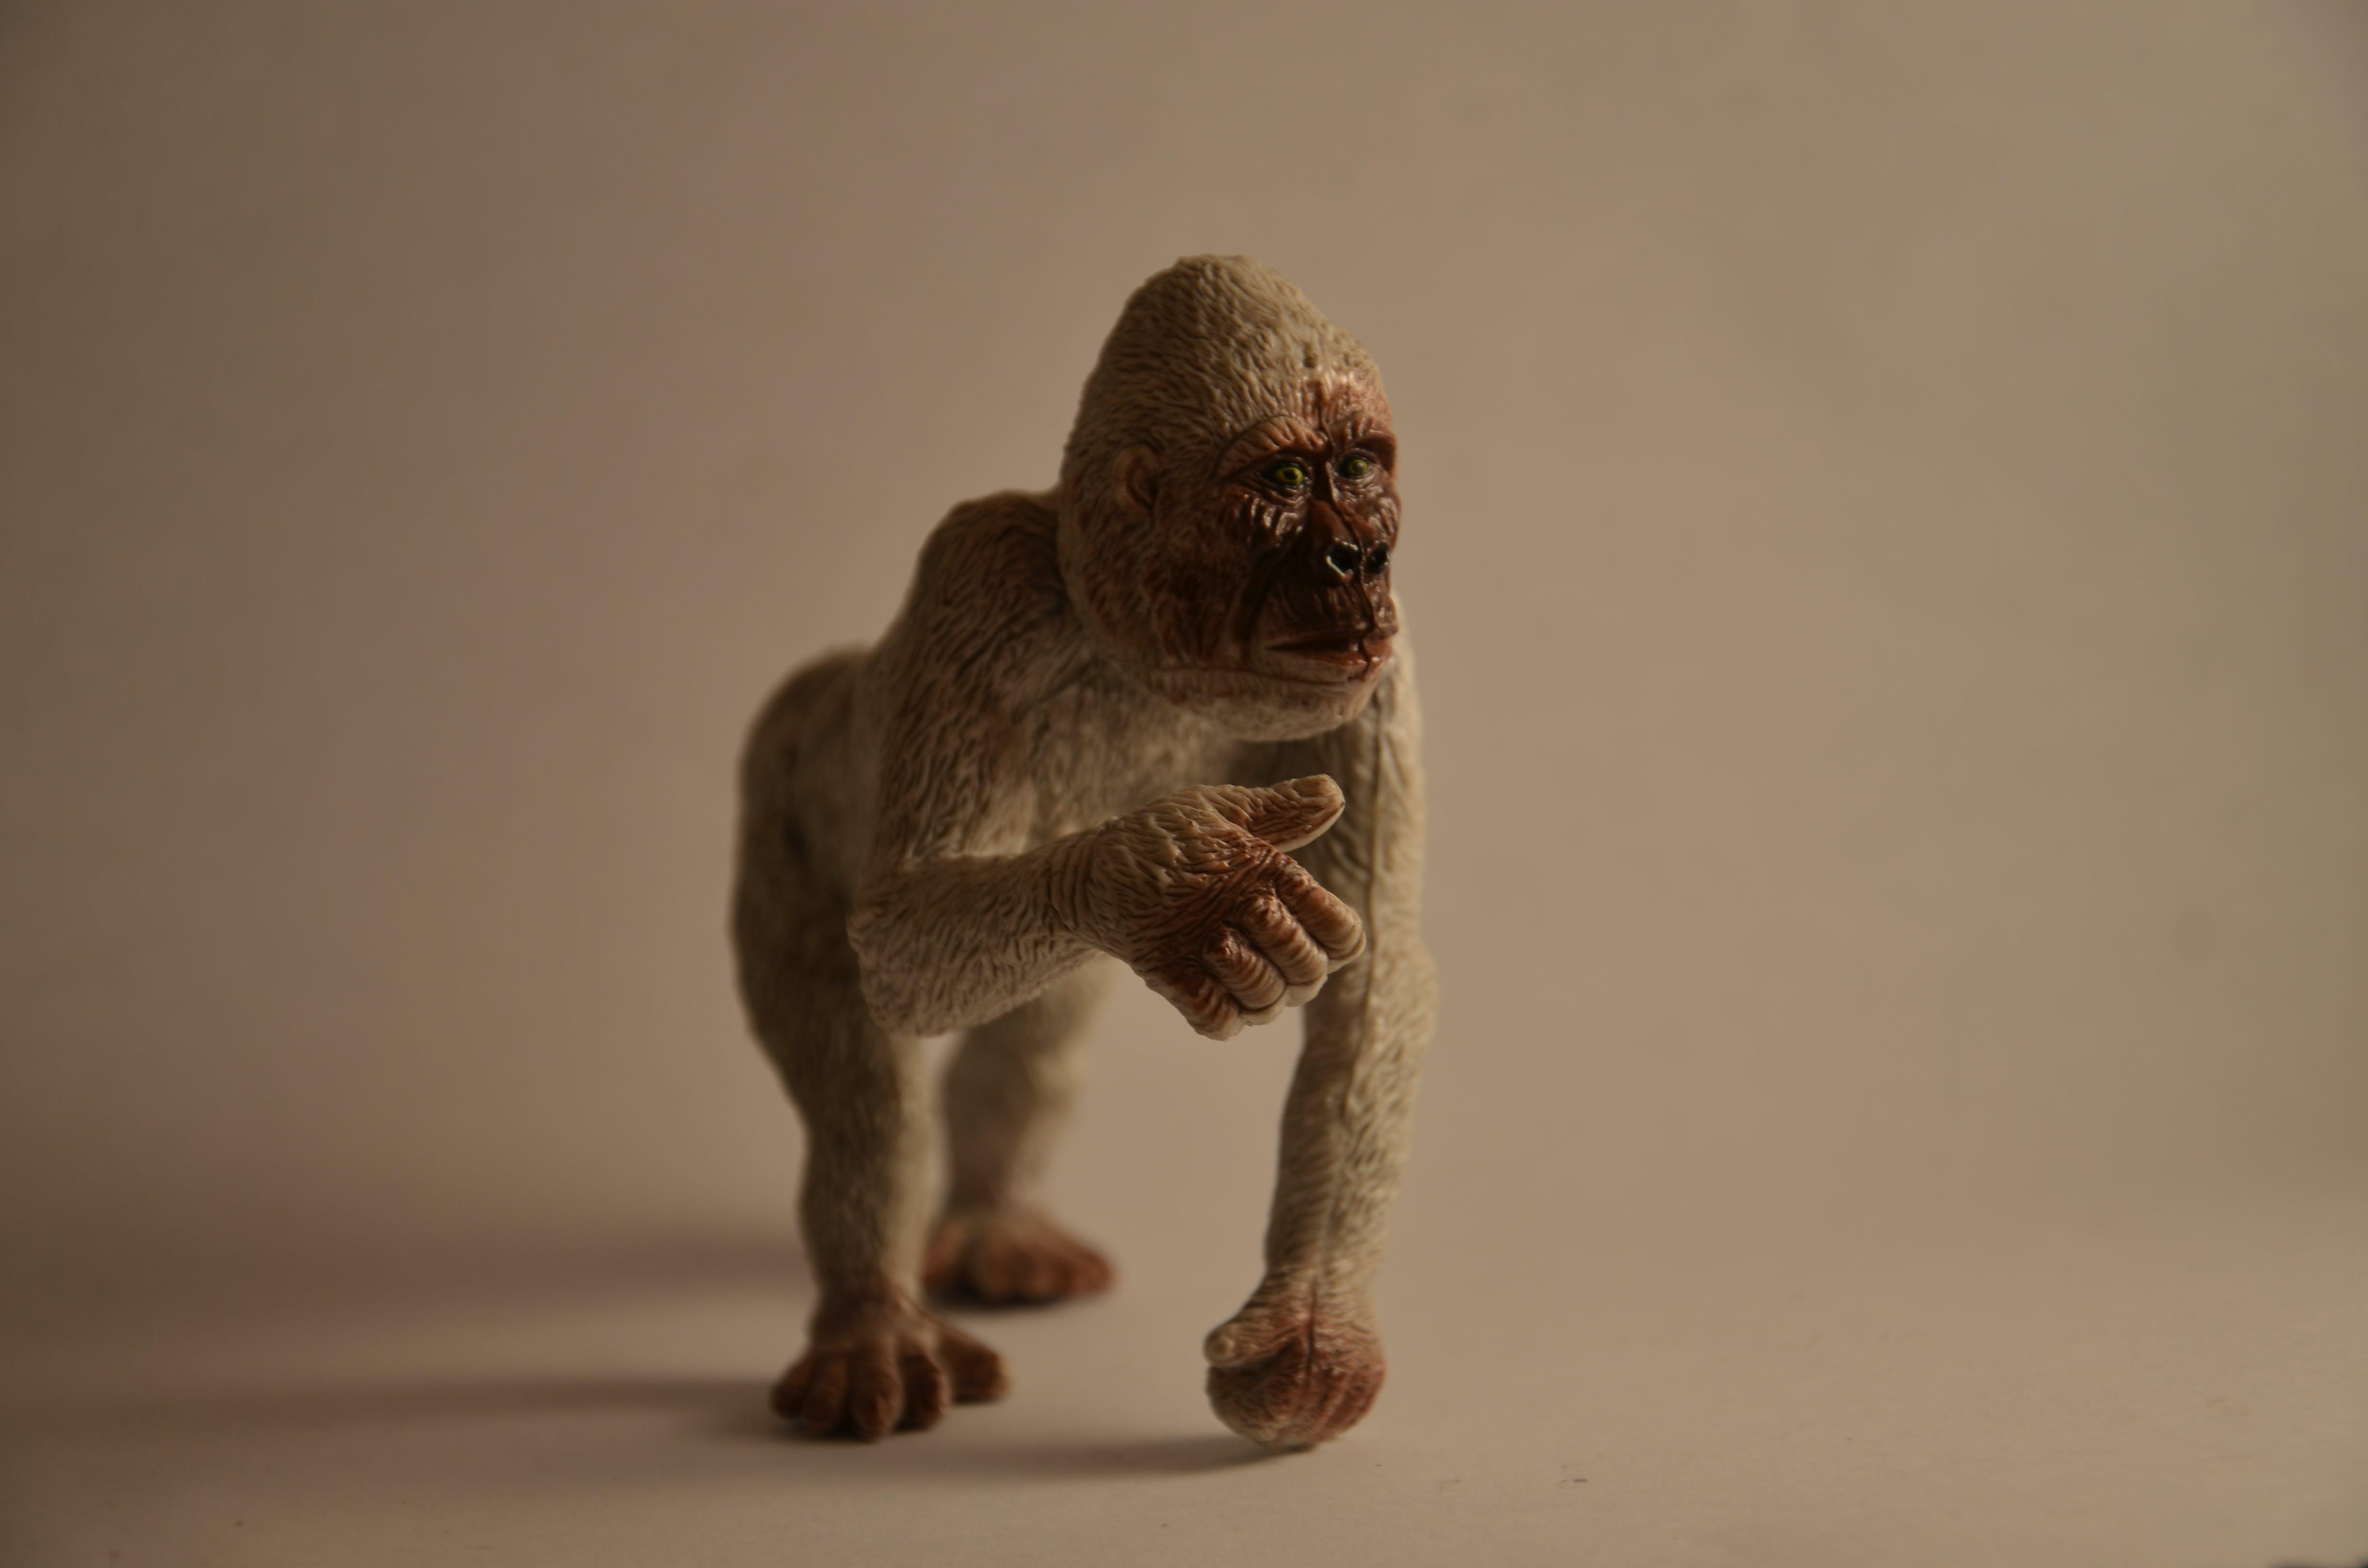 Brown Monkey Toy